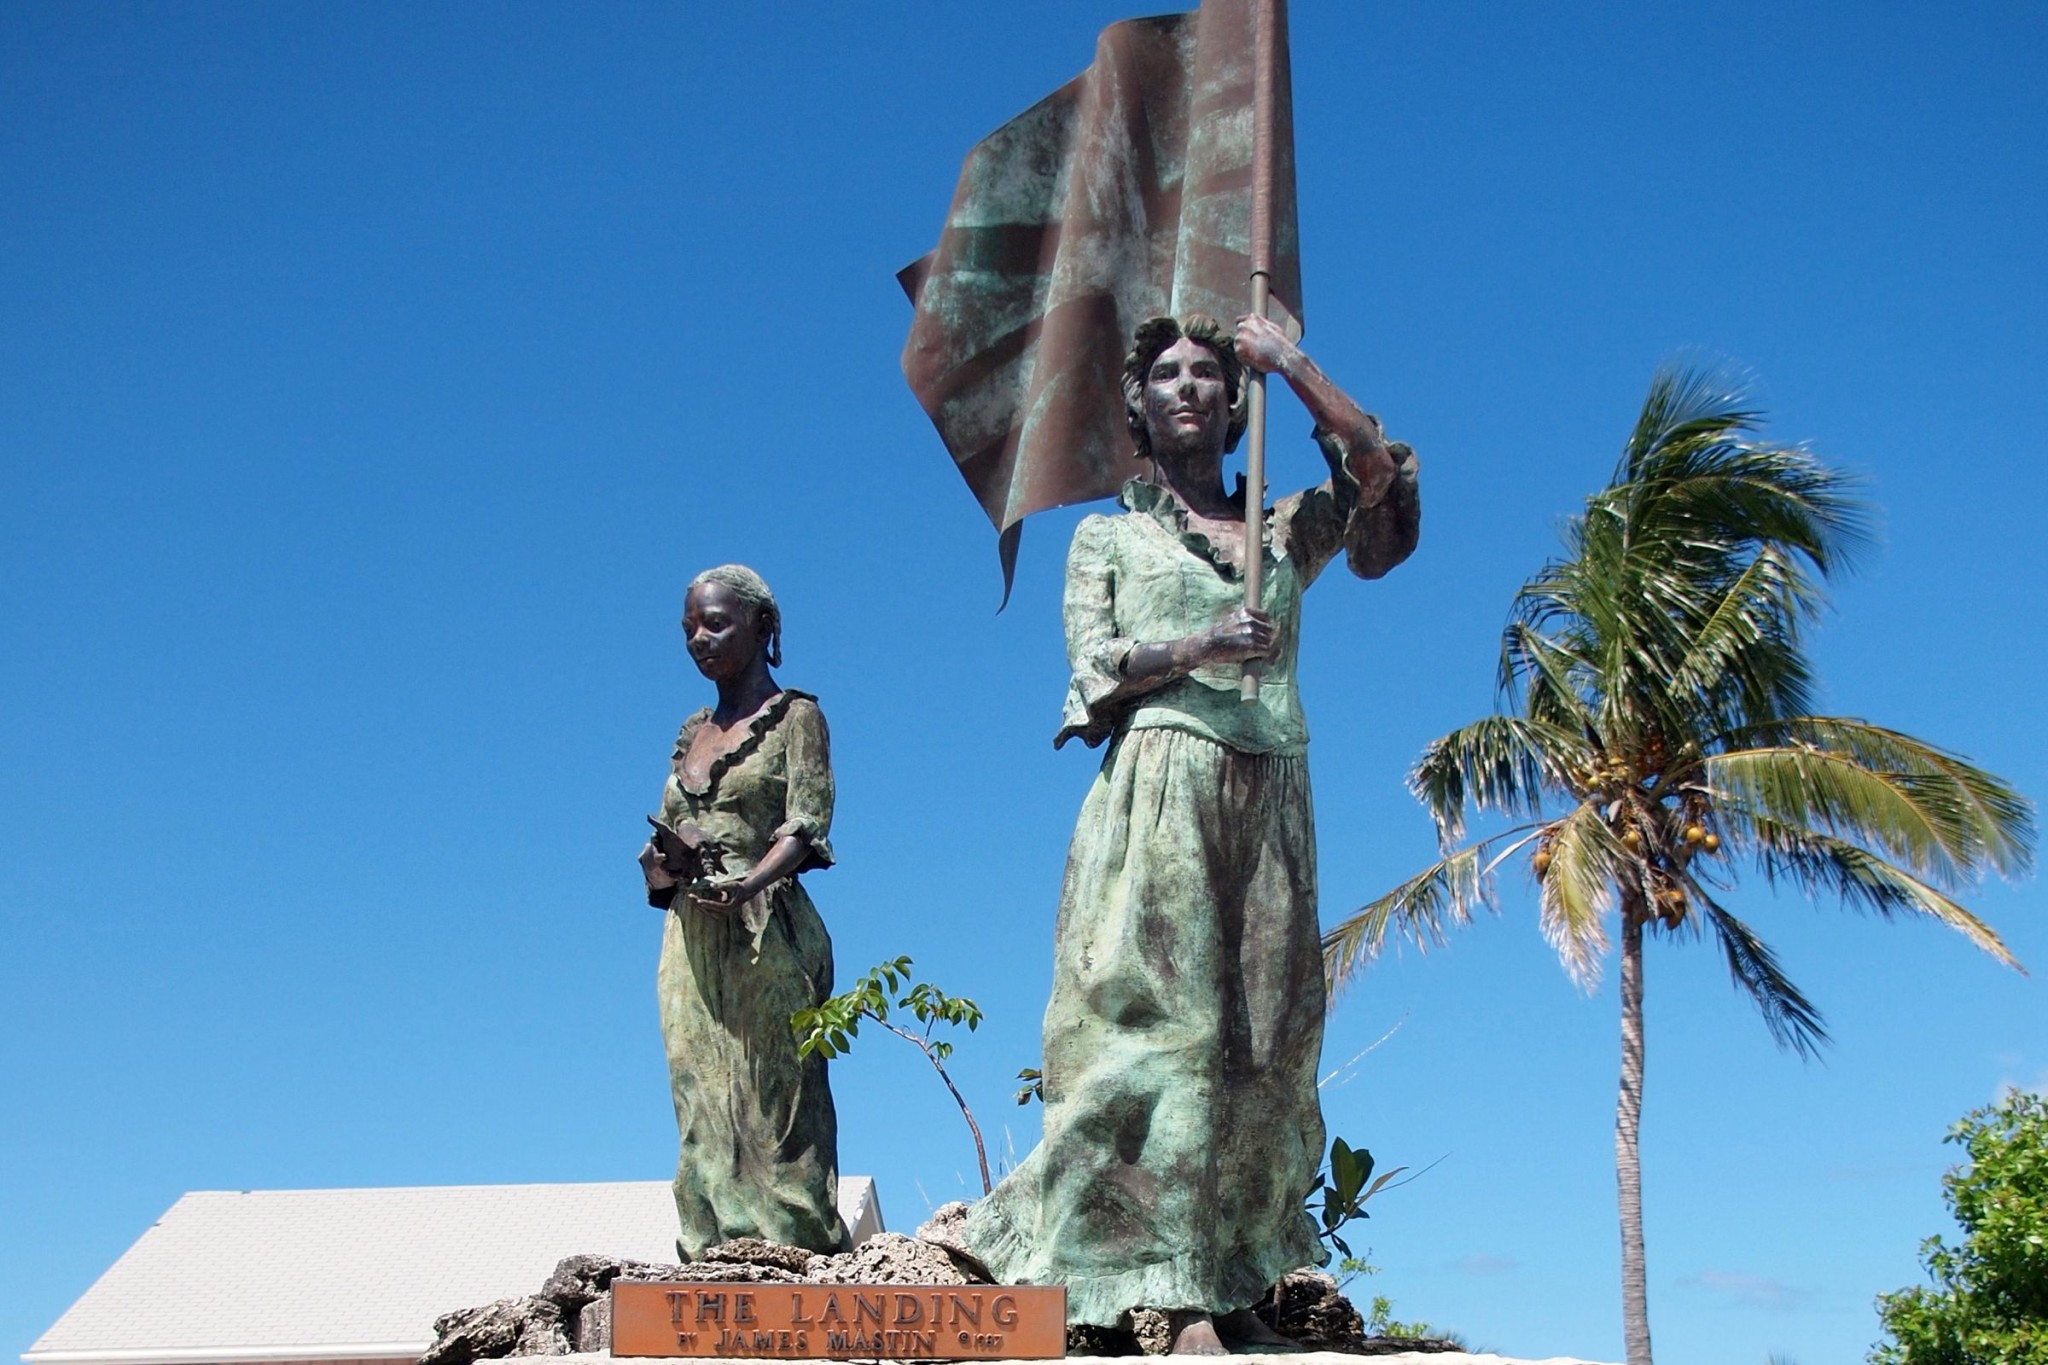 Green Turtle Cay's Haunting Loyalist Sculpture Garden: Uncommon Attraction